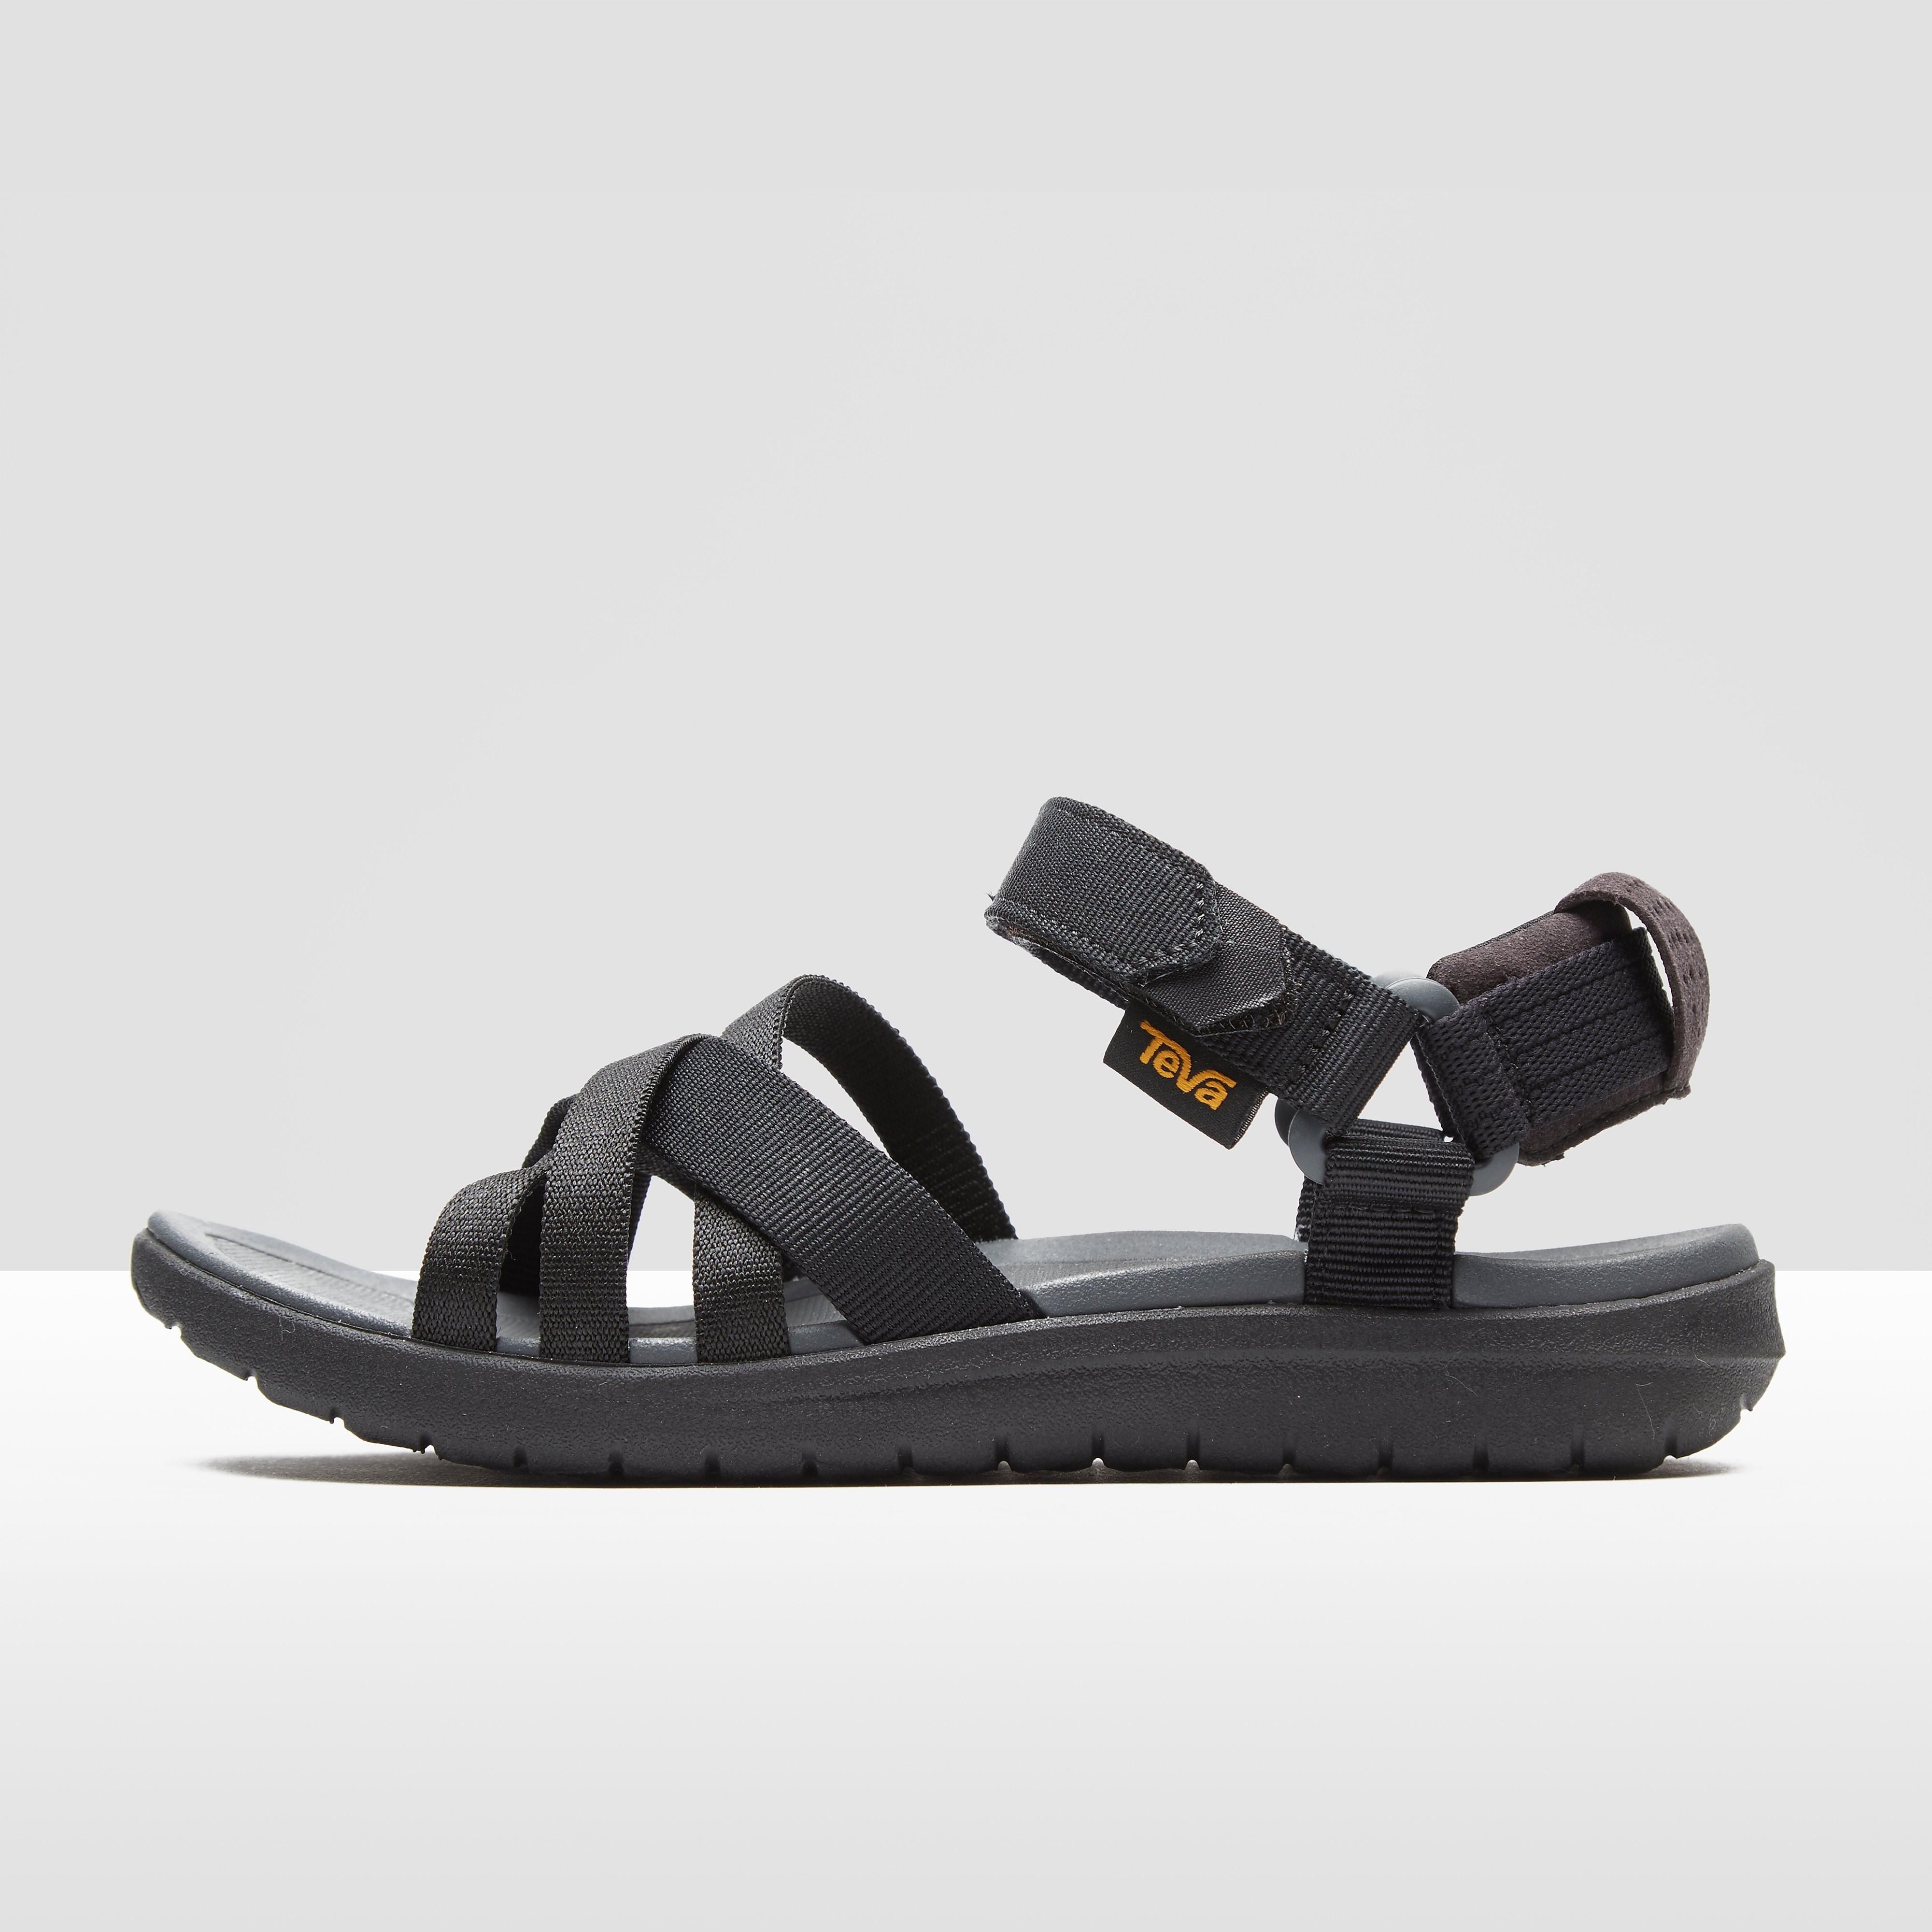 Teva Sanborn Universal Women's Sandals